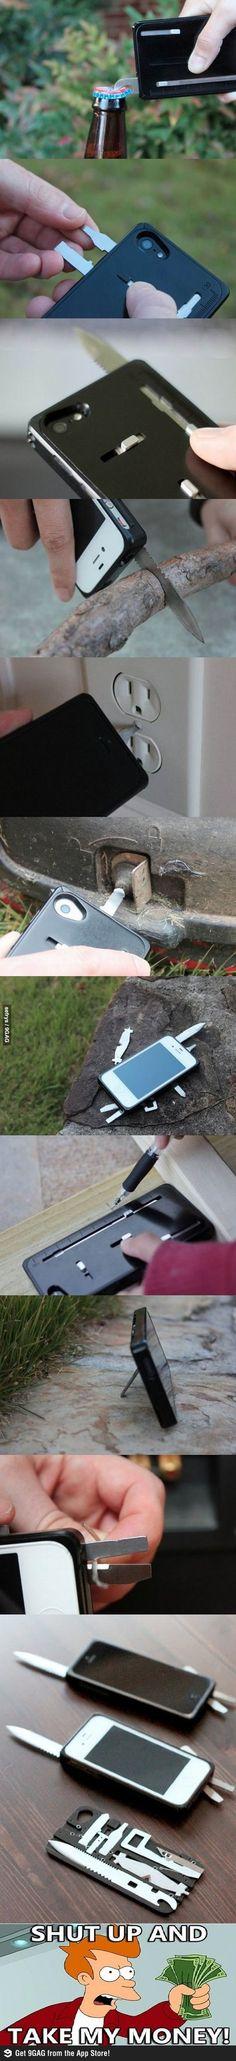 Zwitsers iPhonehoesje.